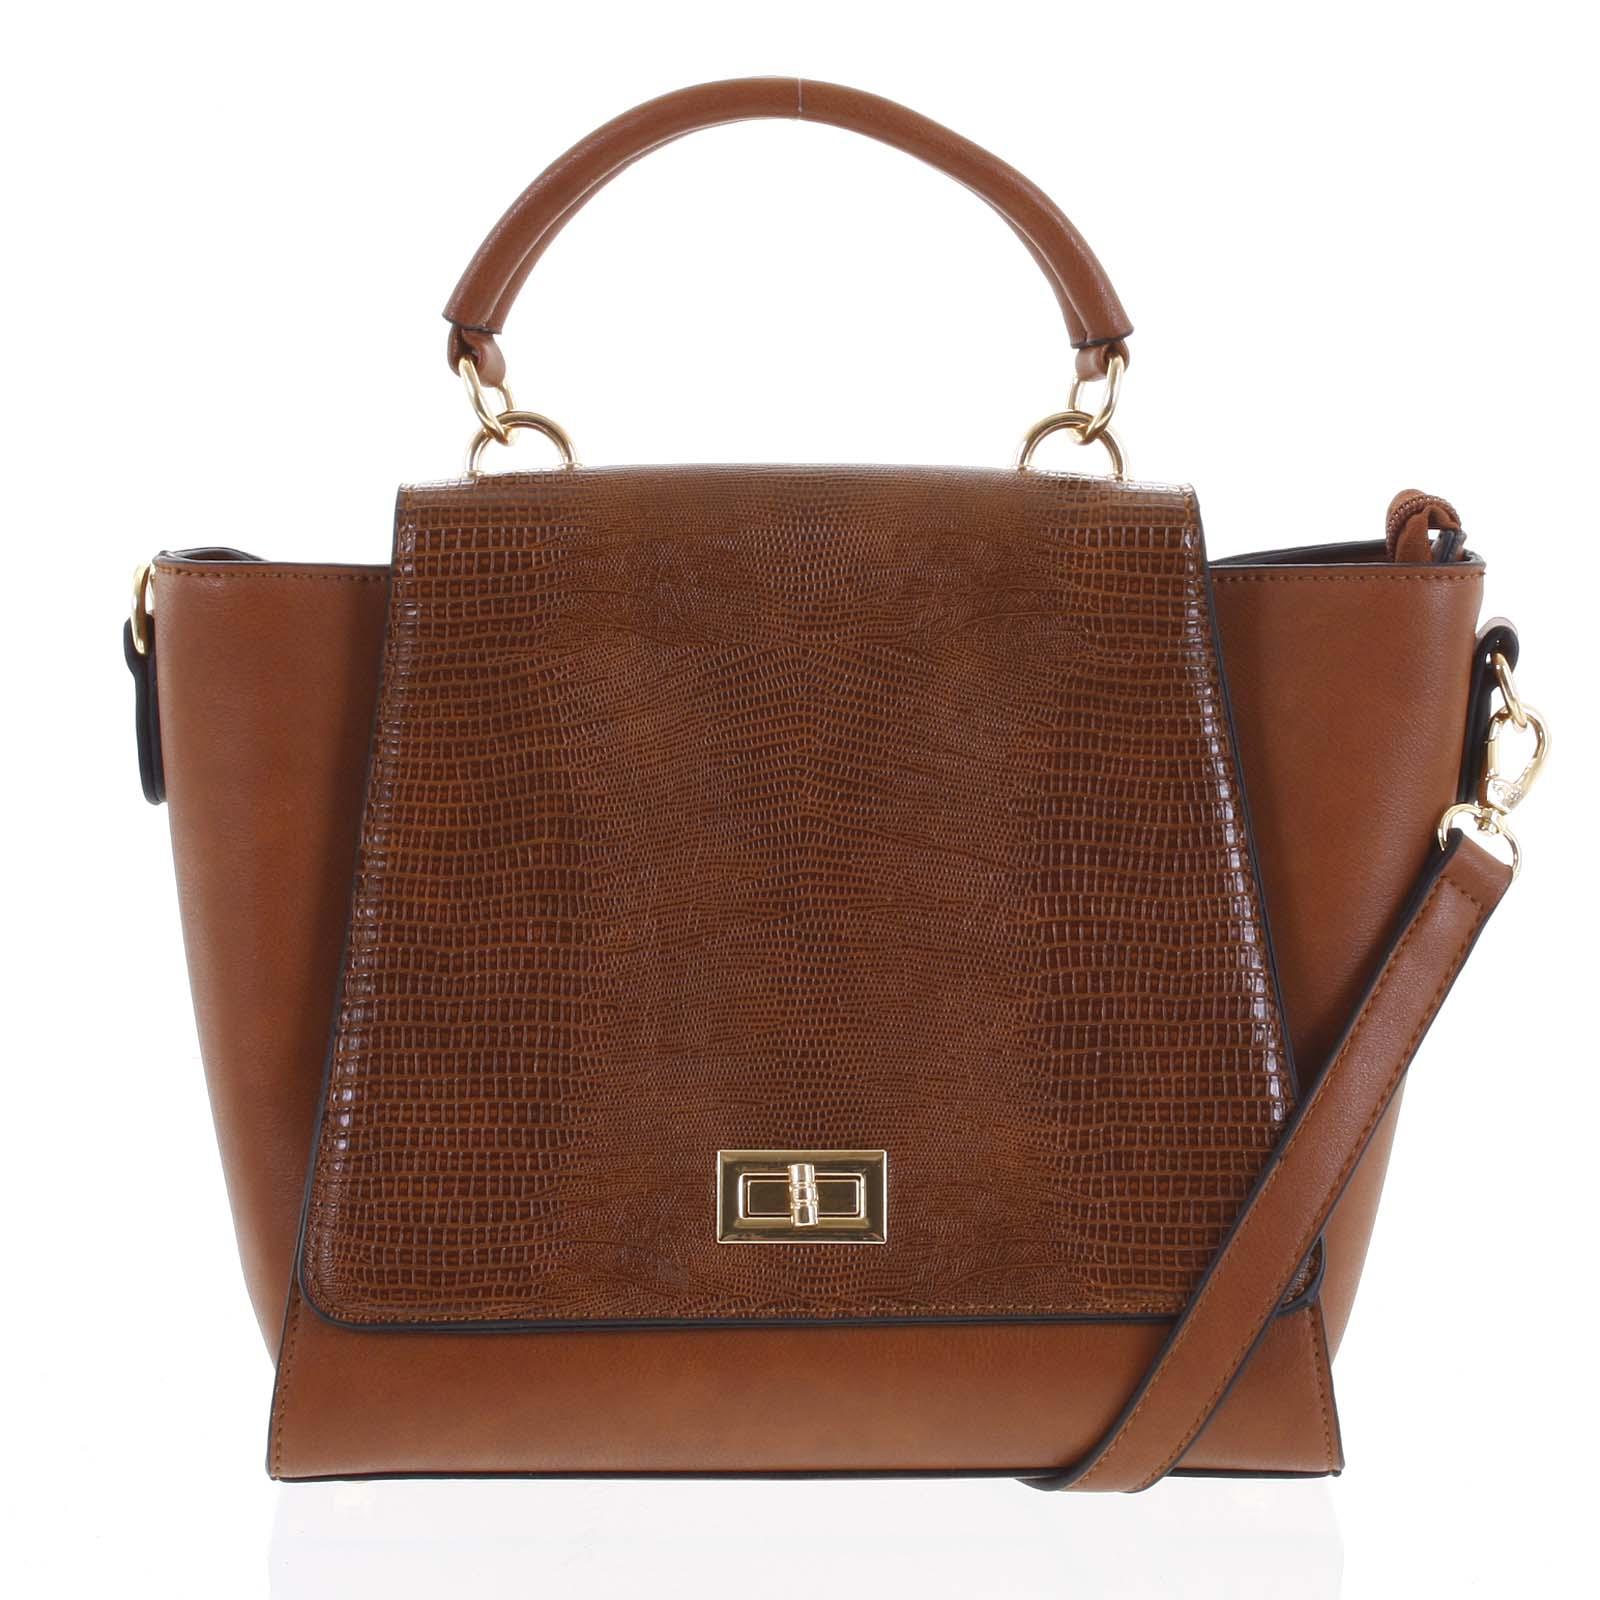 Dámska kabelka do ruky svetlo hnedá - Dudlin Mirla